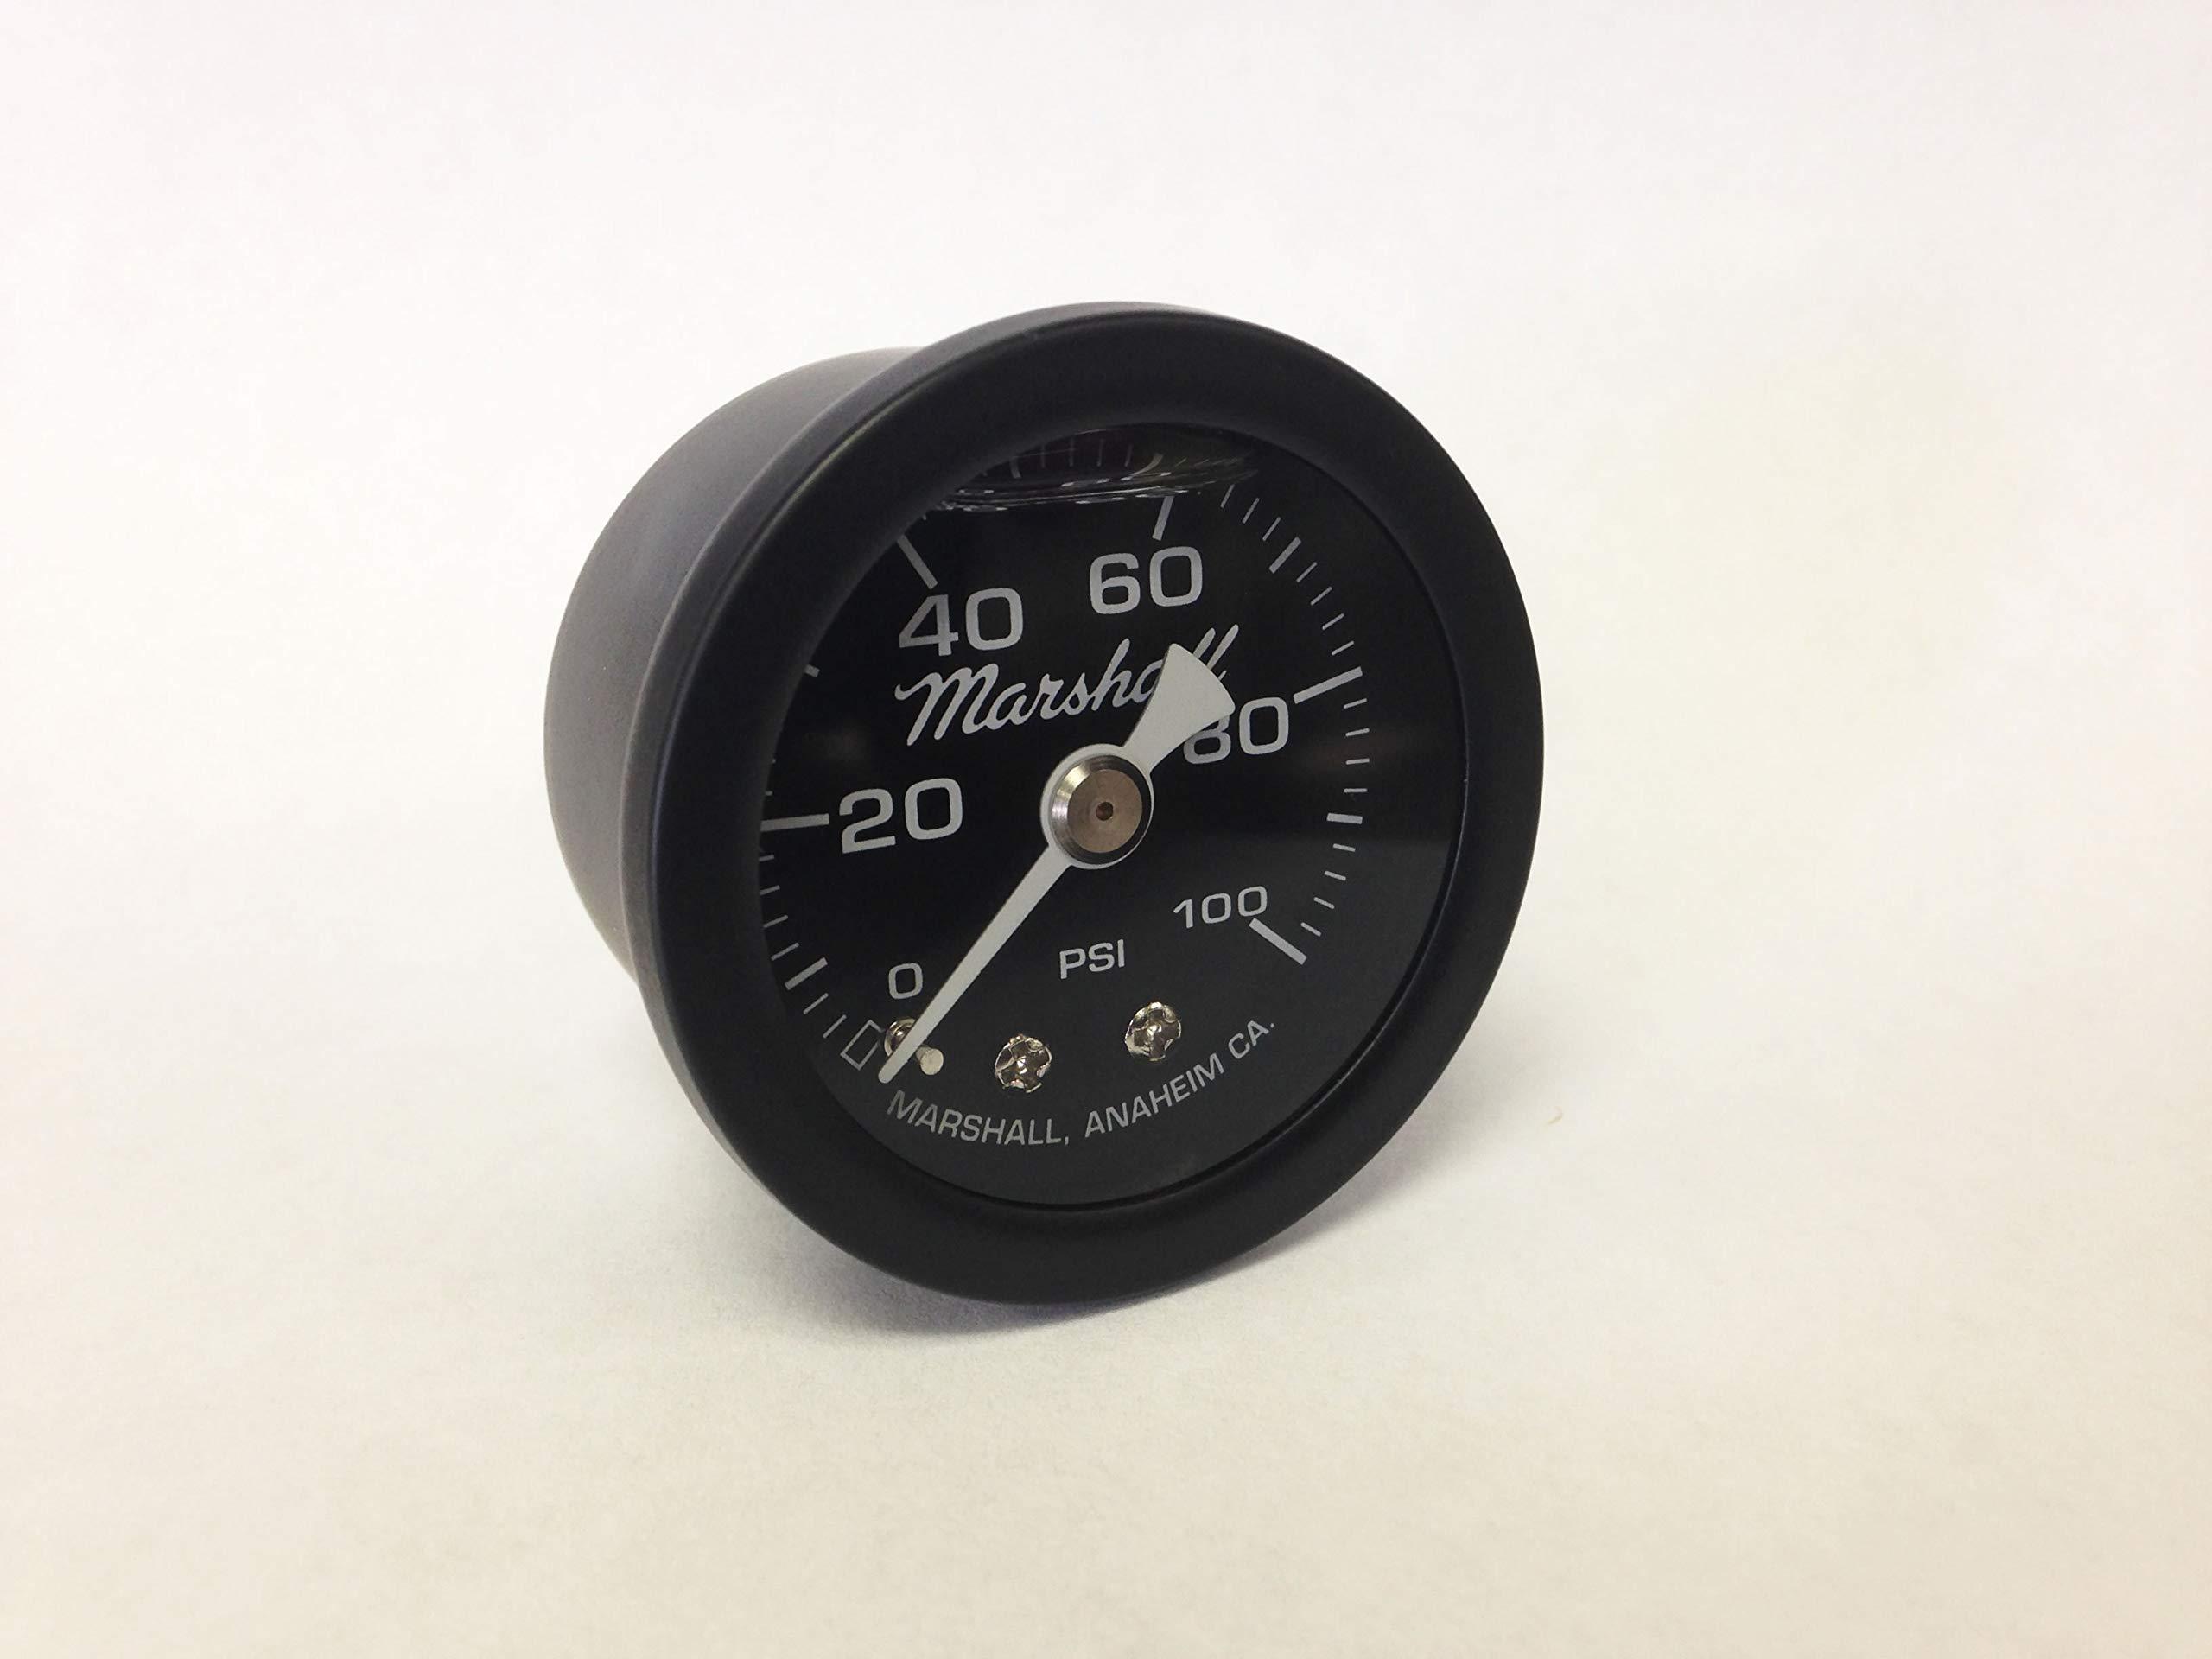 Marshall Instruments MSB00100 Liquid Filled Fuel/Oil Pressure Gauge Black by Marshall Instruments